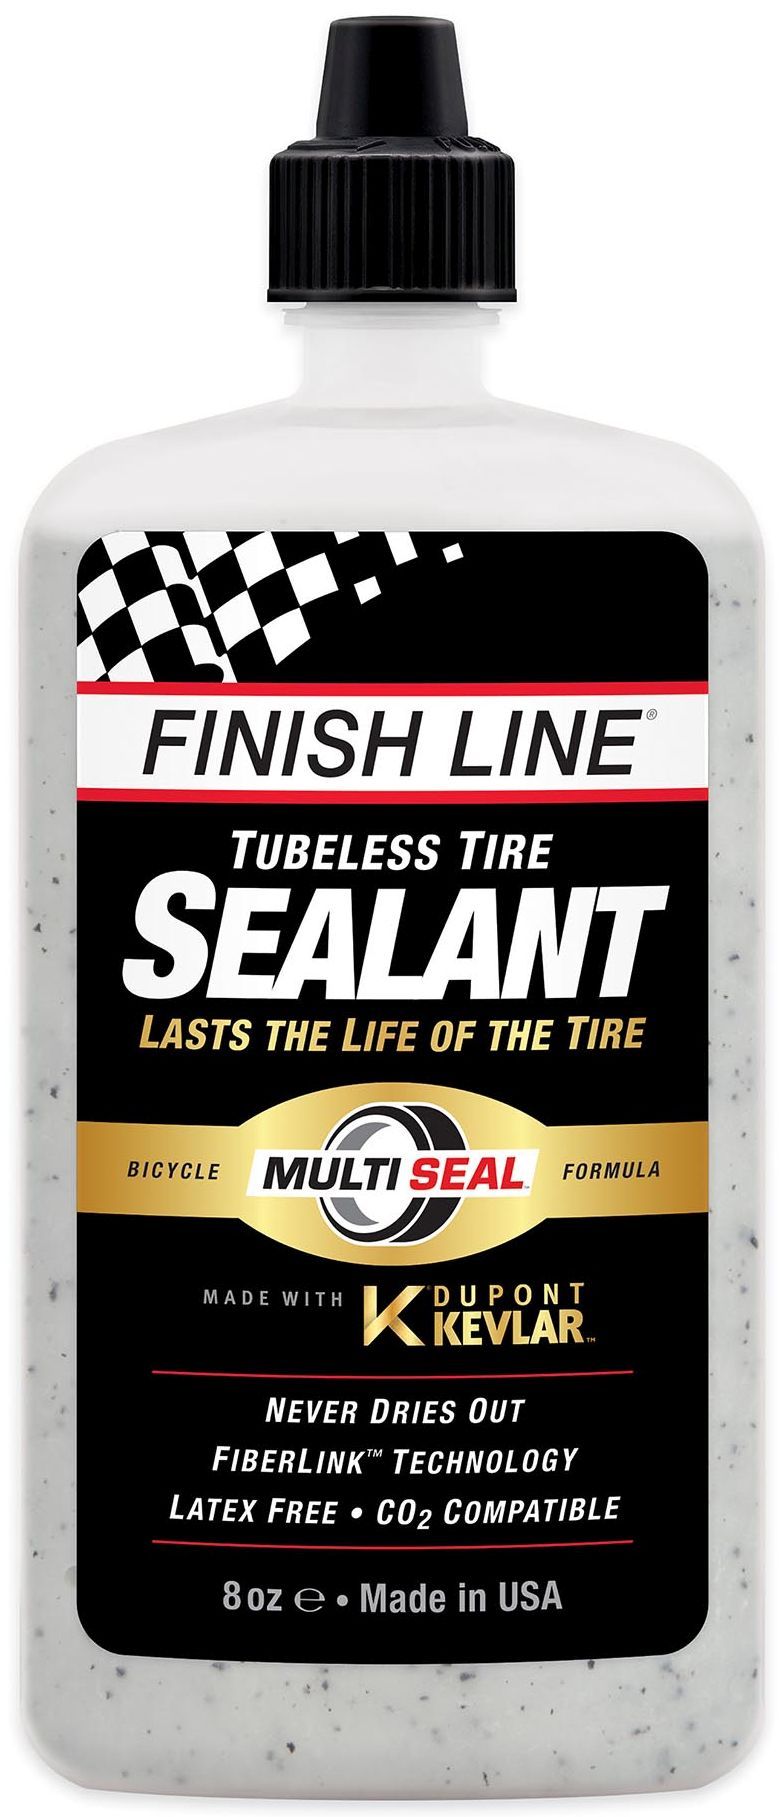 Tubeless Tire Sealant 240ml uni